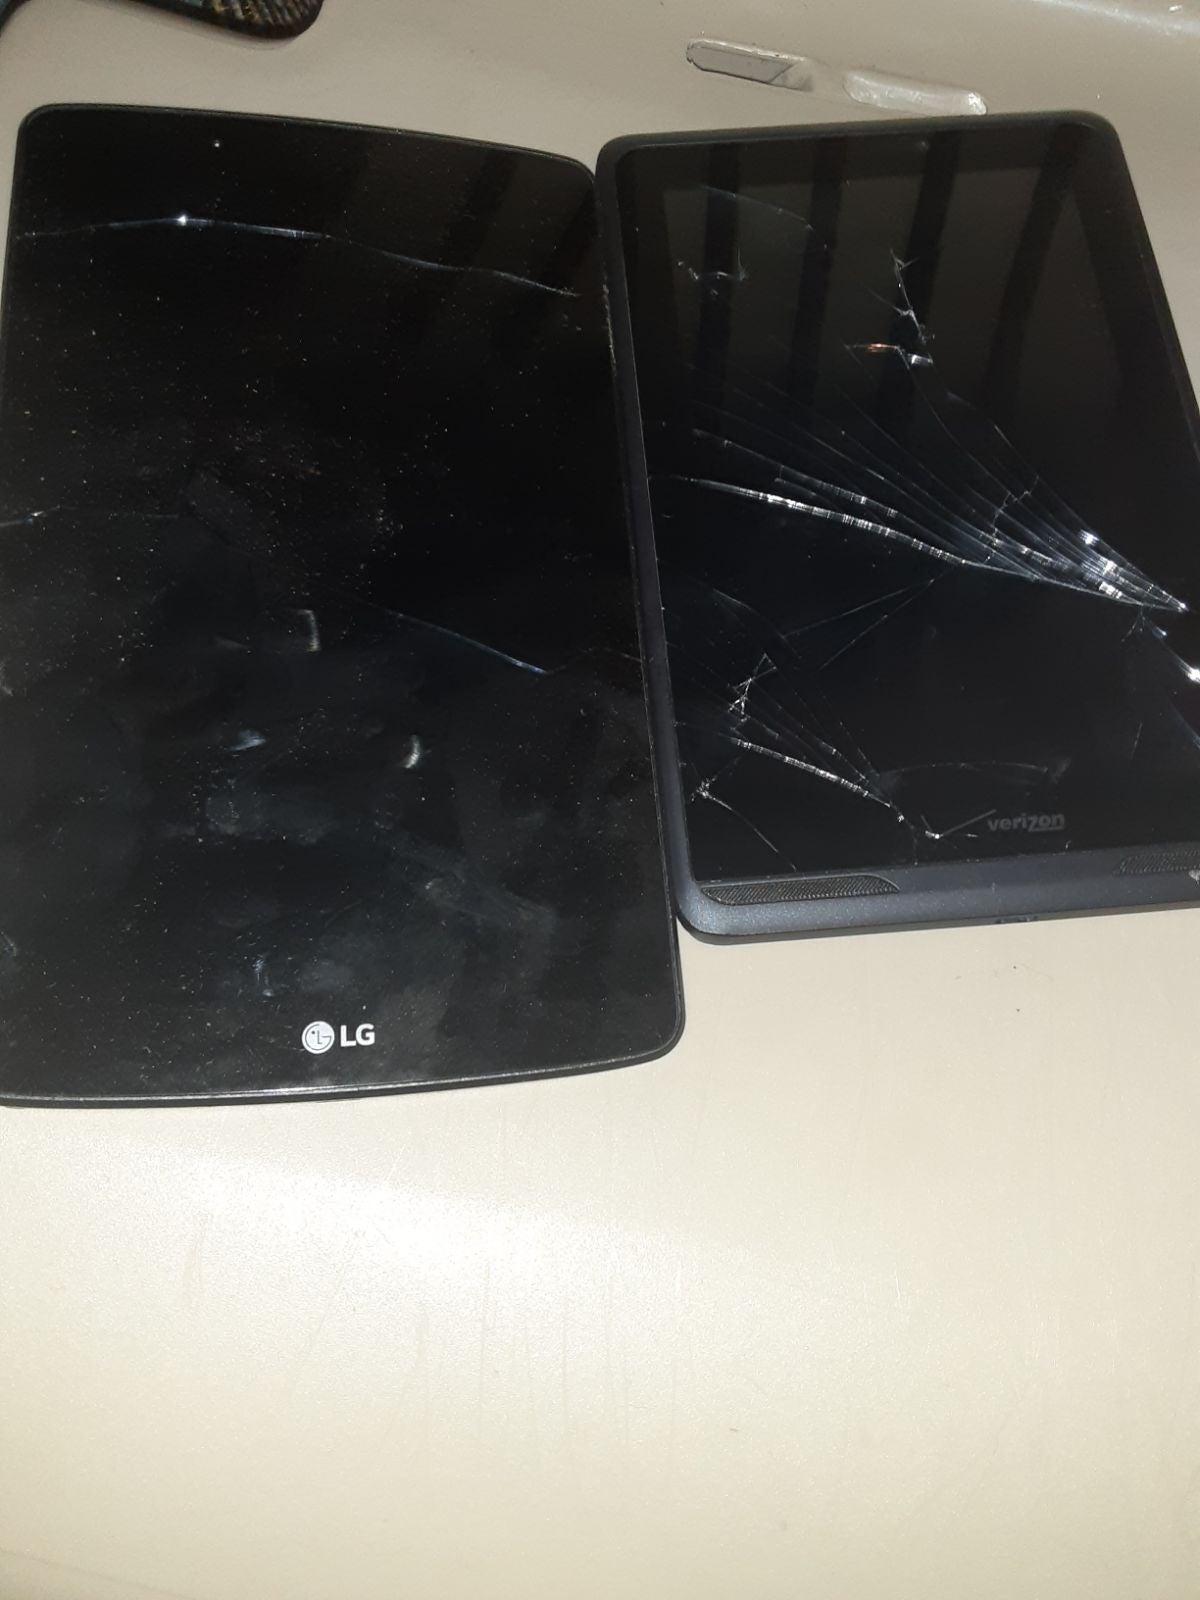 Verizon, Amazon, & T mobile tablet bundl